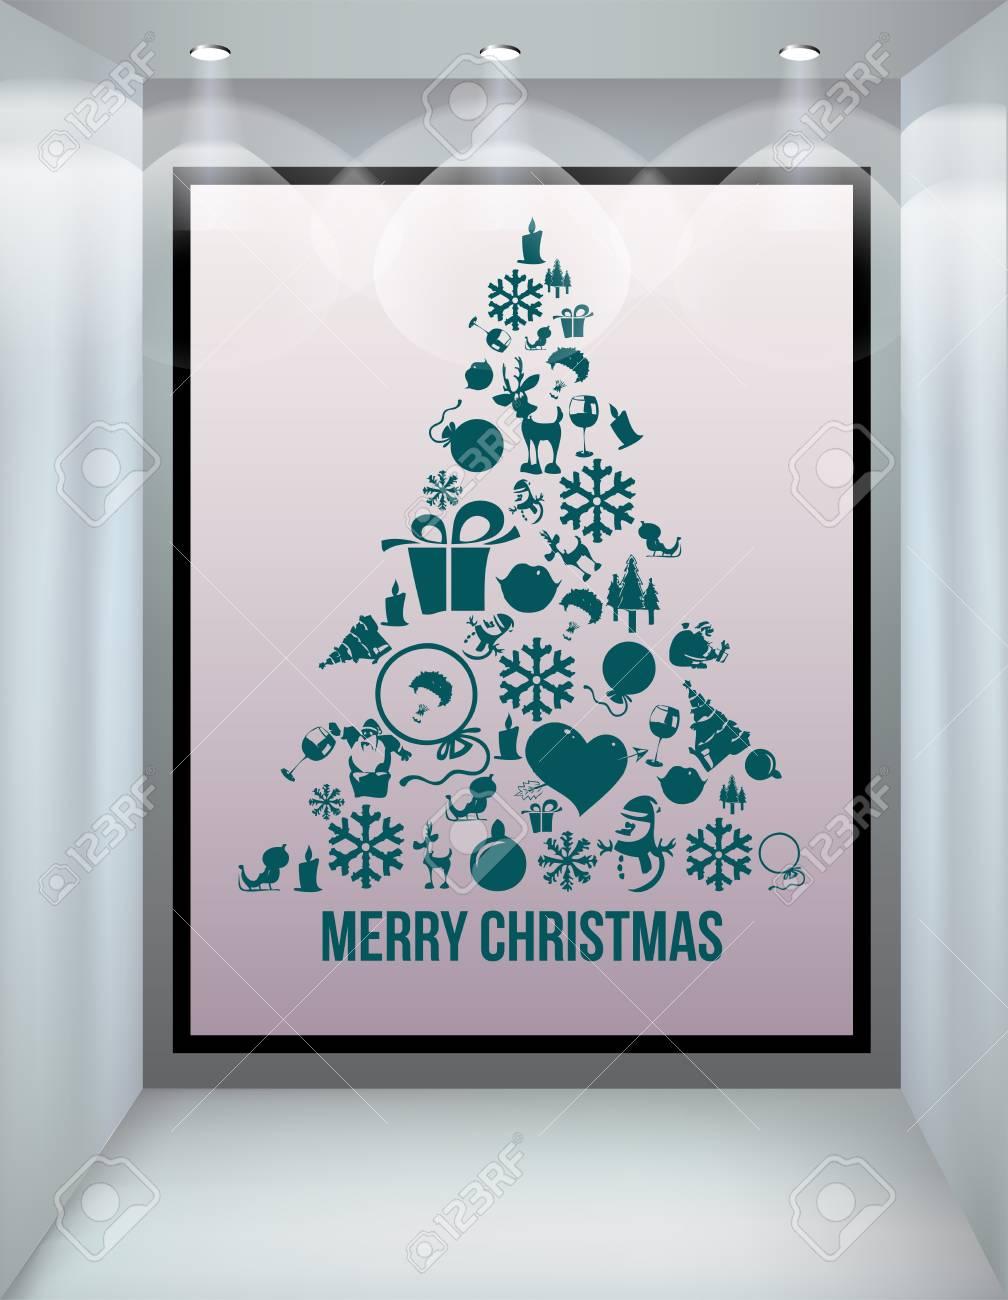 Christmas tree applique vector  background. Stock Vector - 15500863